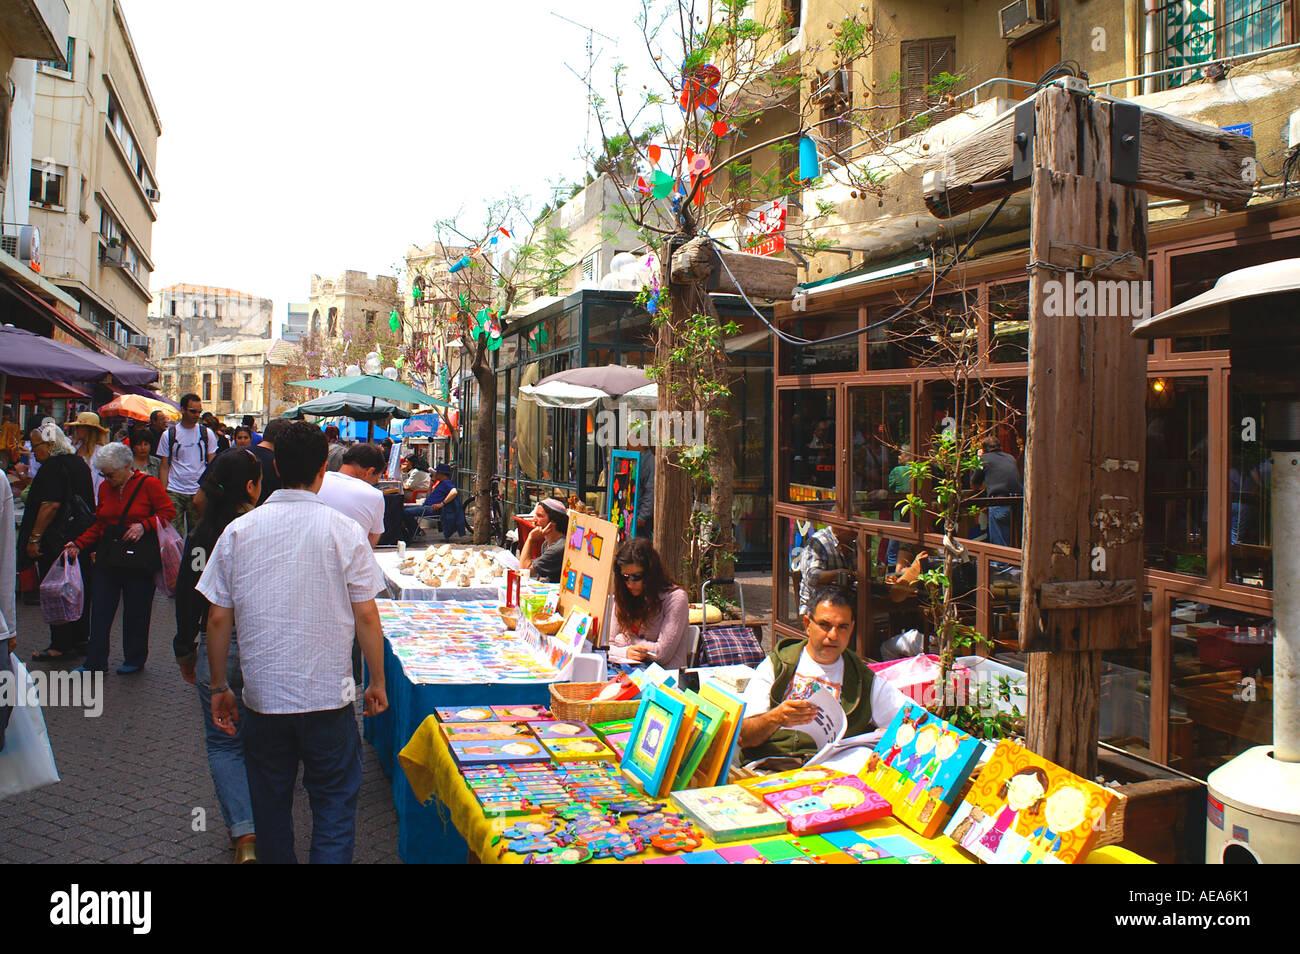 The weekly tel aviv arts and crafts fair nachlat binyamin for Arts and crafts fairs